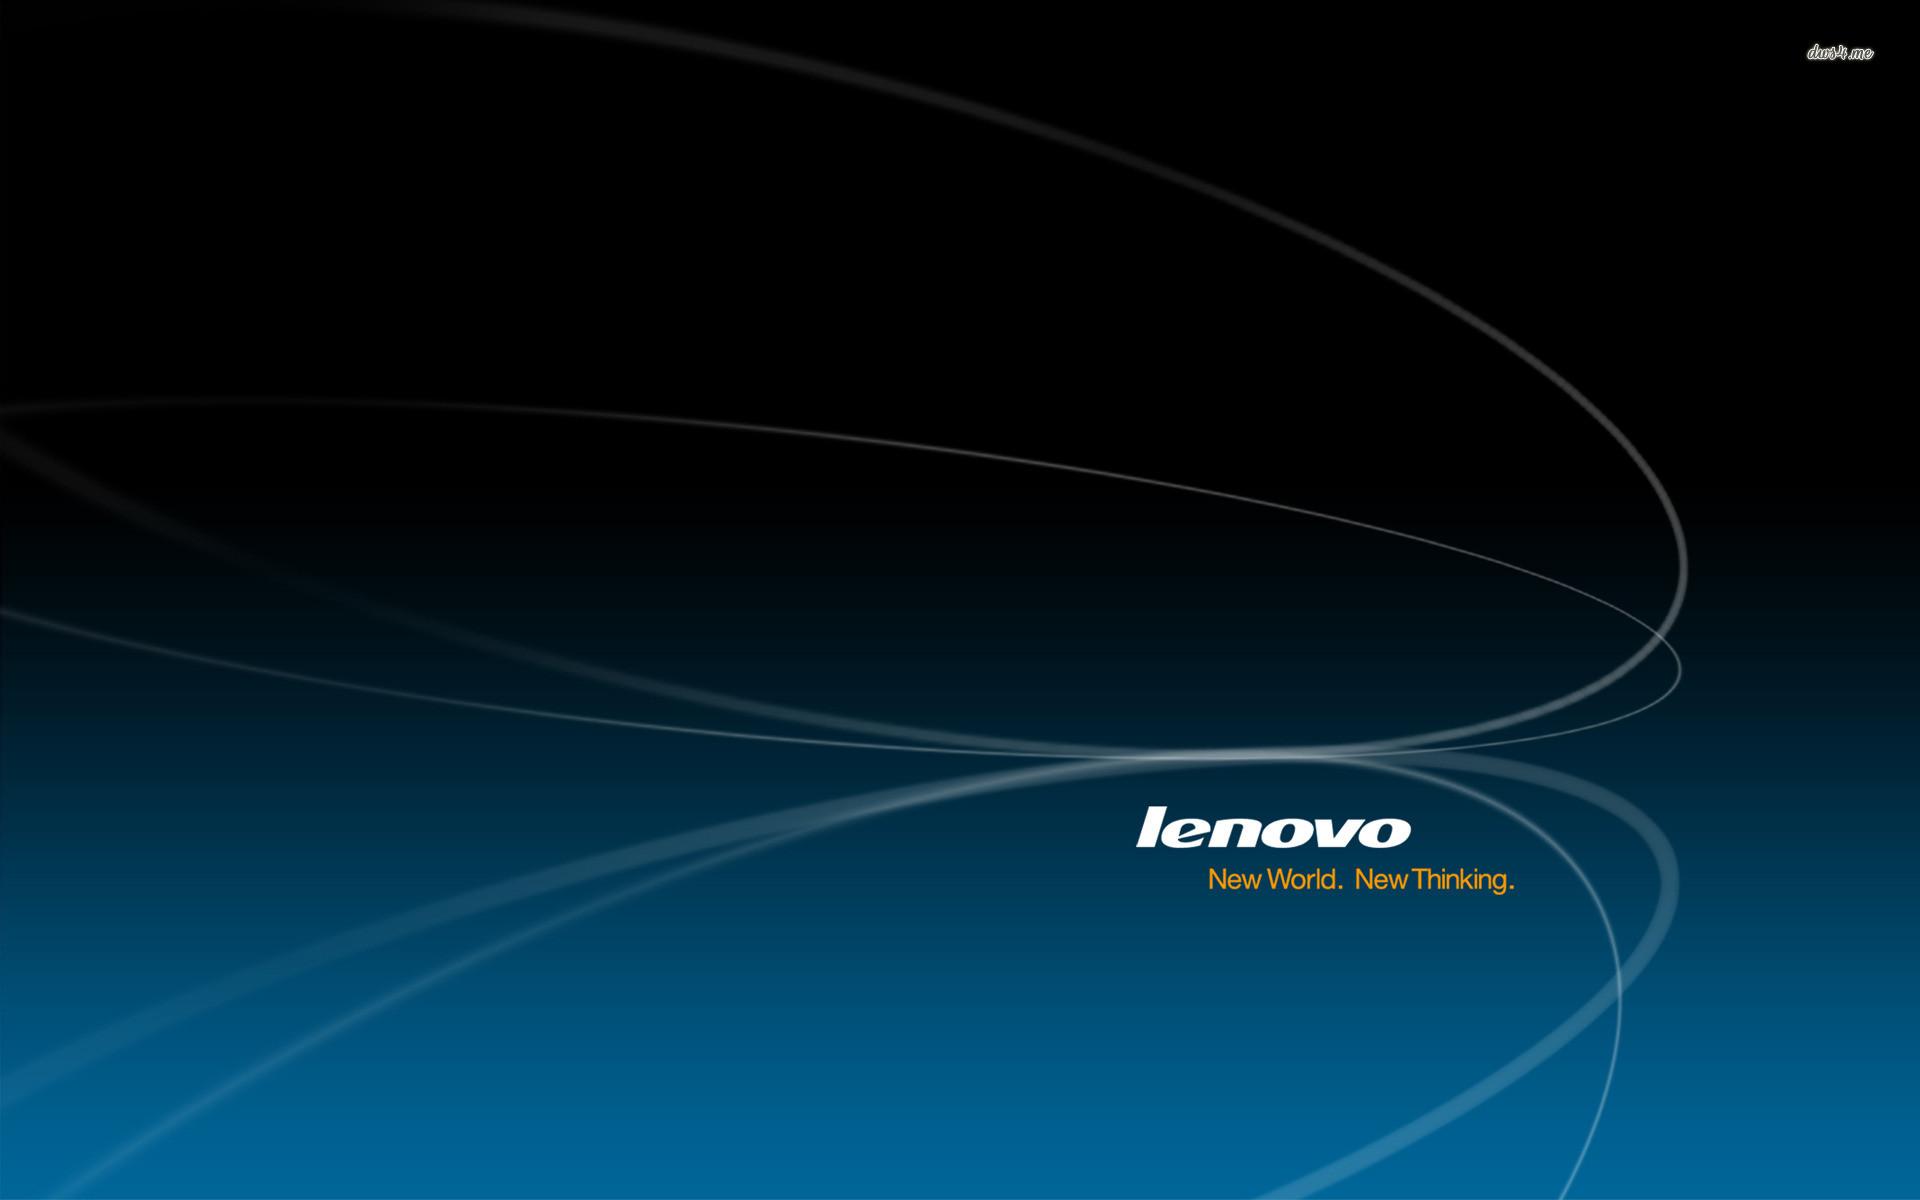 Lenovo Wallpaper Car: Lenovo 1366x768 Wallpapers (71+ Images